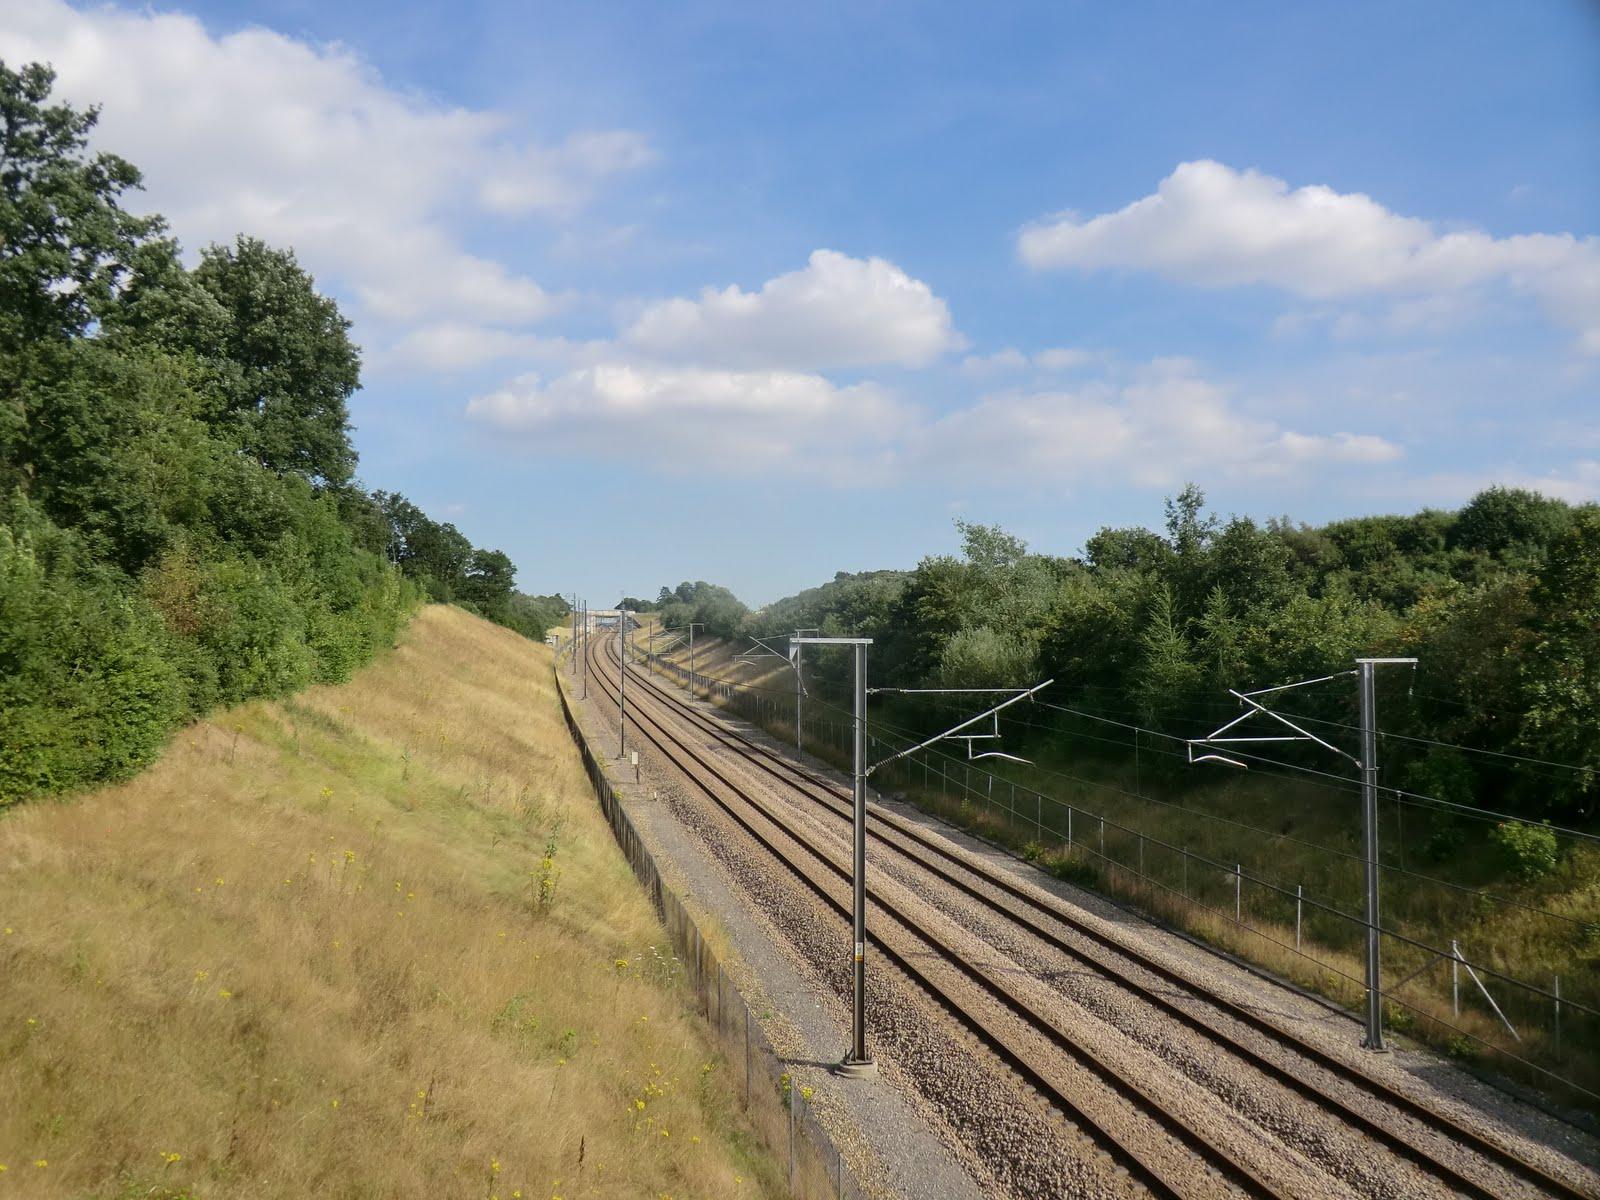 CIMG3010 Crossing the high-speed railway